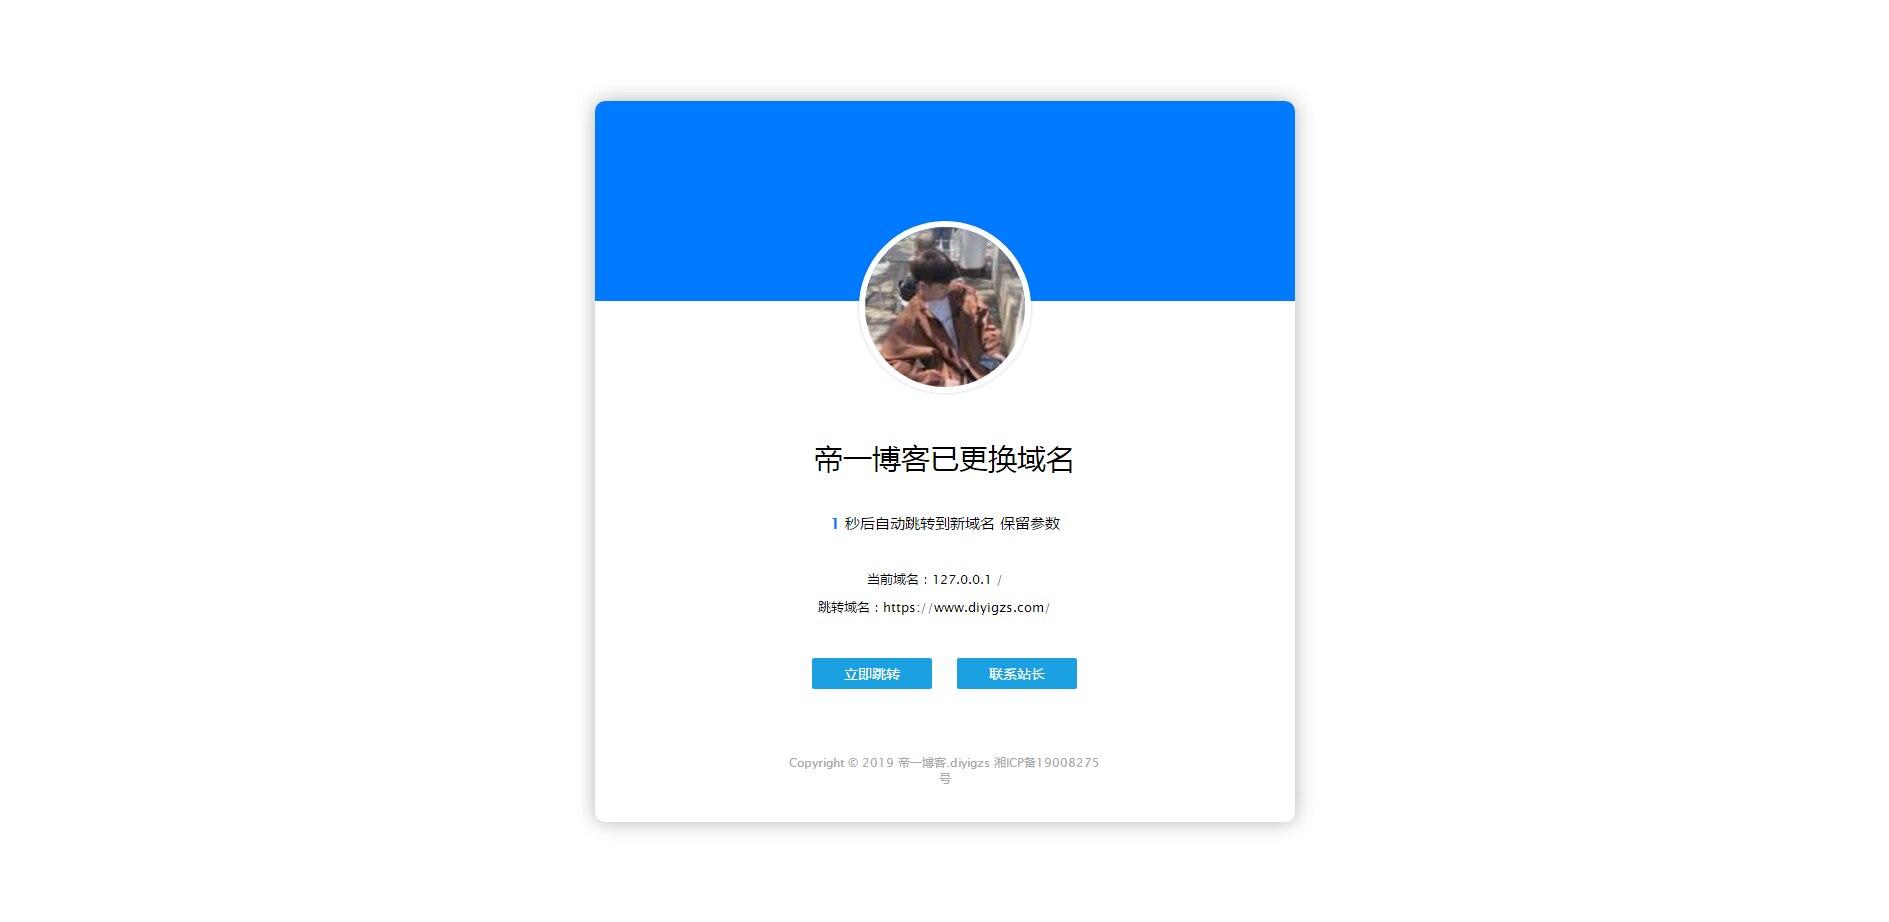 php实现旧域名自动跳转新域名带参数自适应UI页面